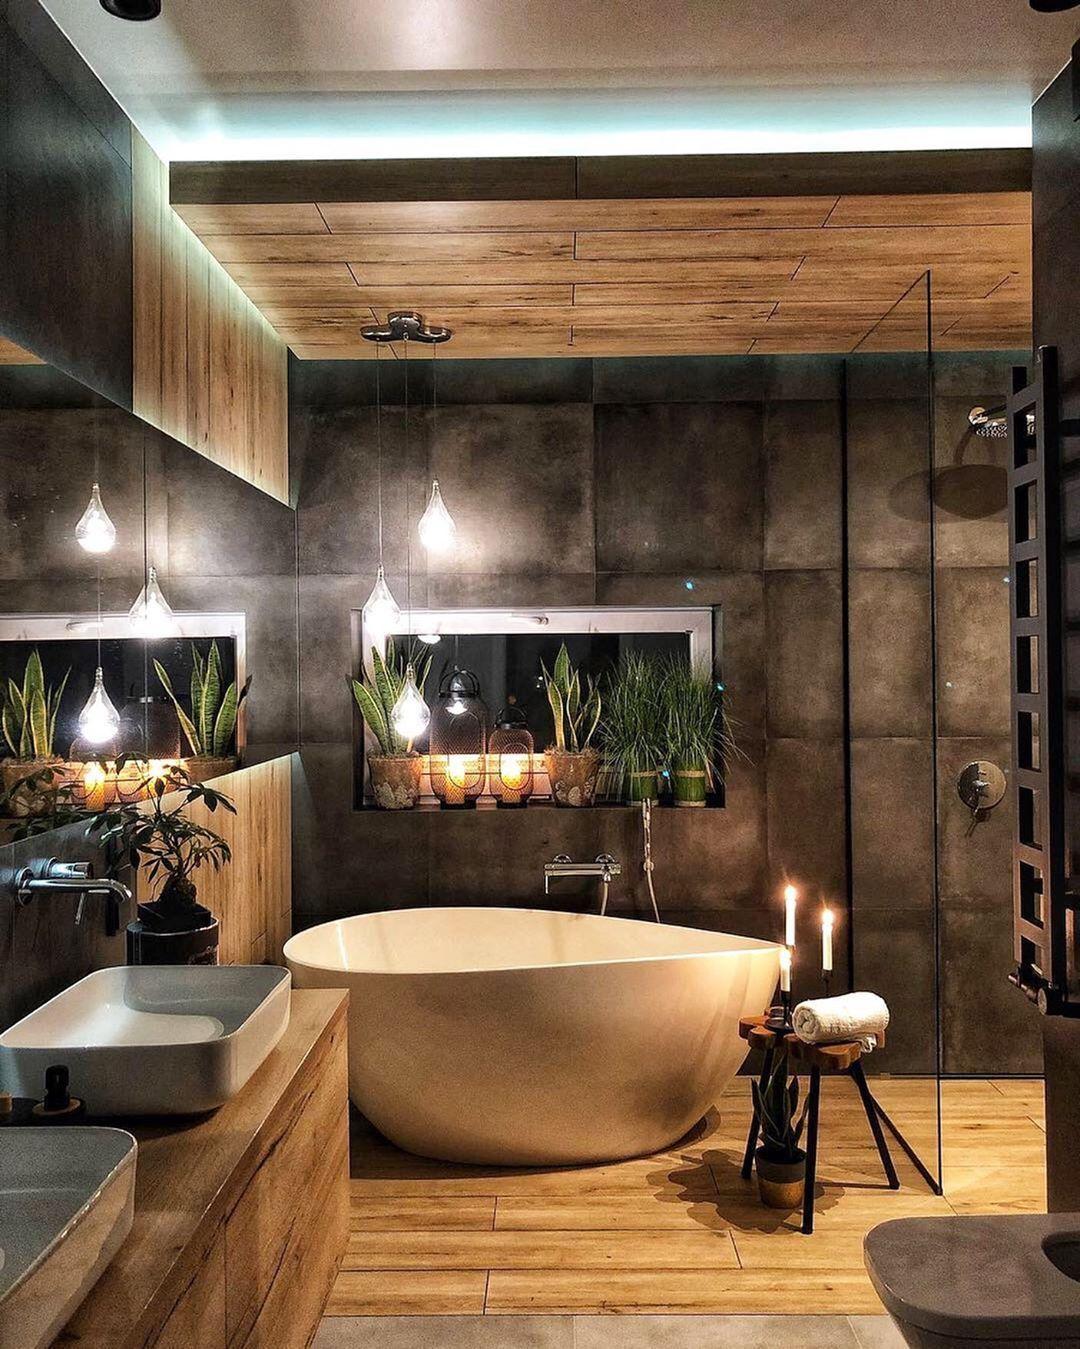 Home Design Ideas Instagram:  Home Design & Decor On Instagram :